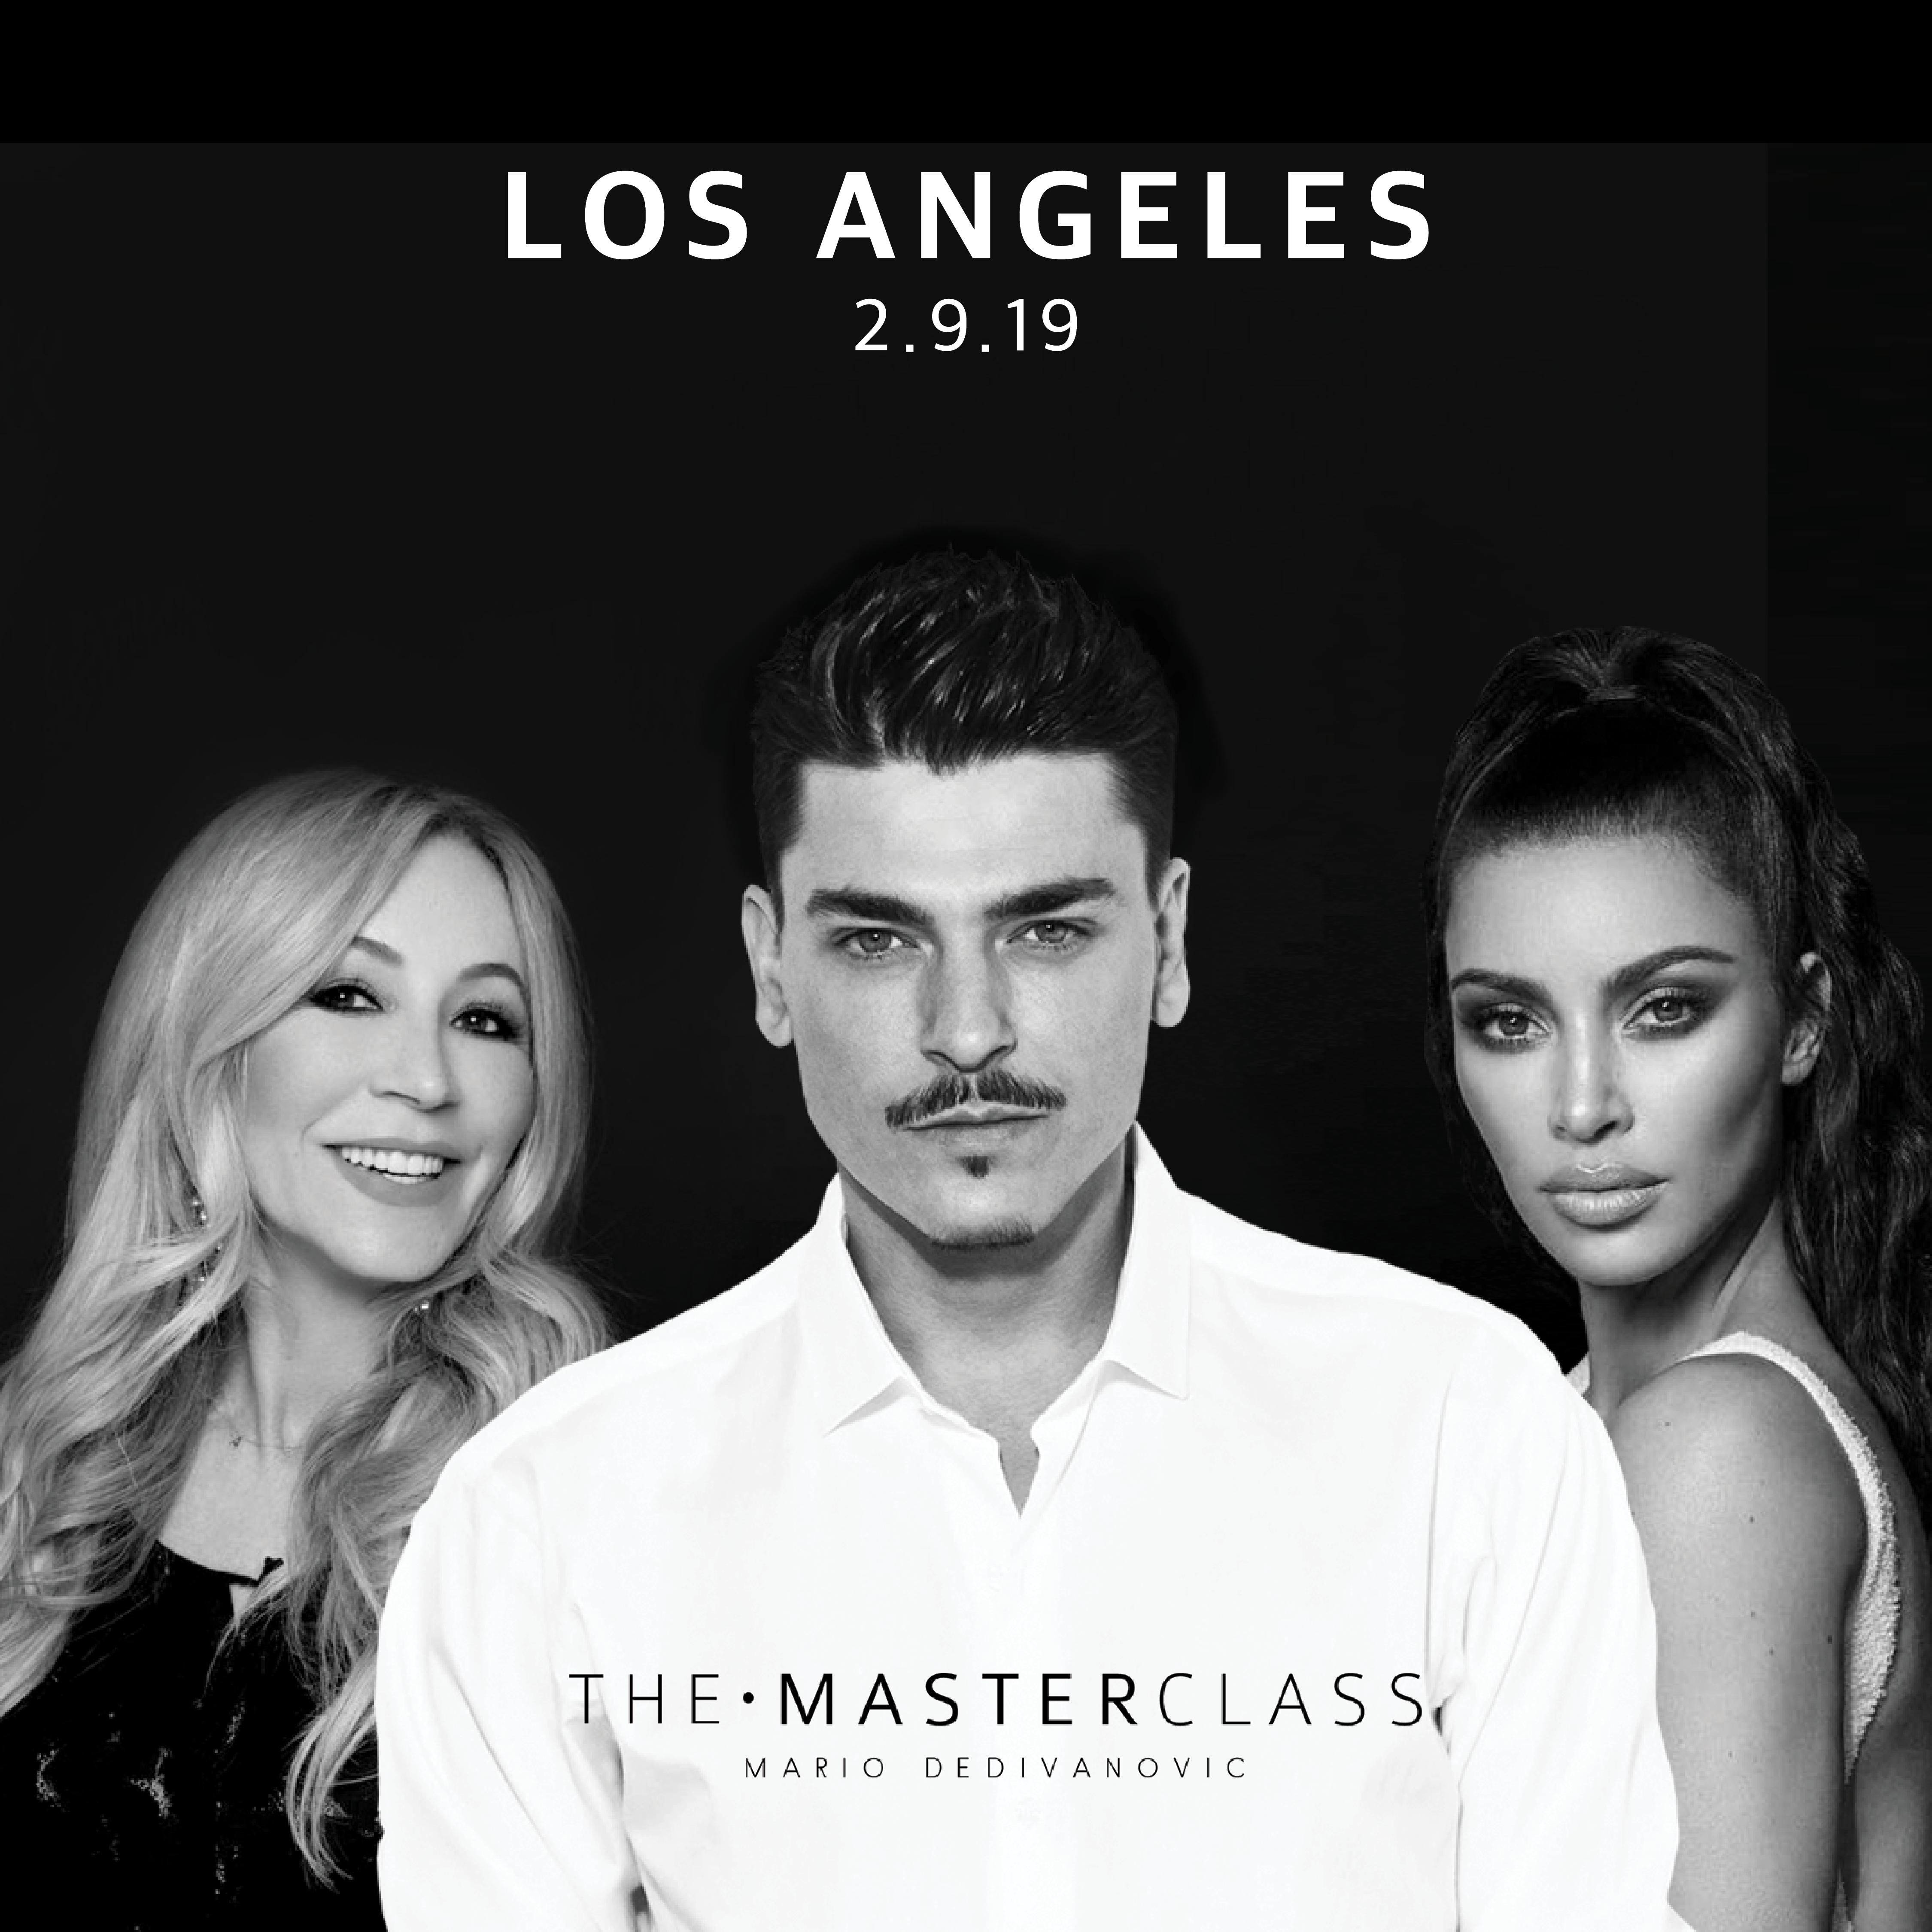 The Masterclass by Mario Dedivanovic with Kim Kardashian